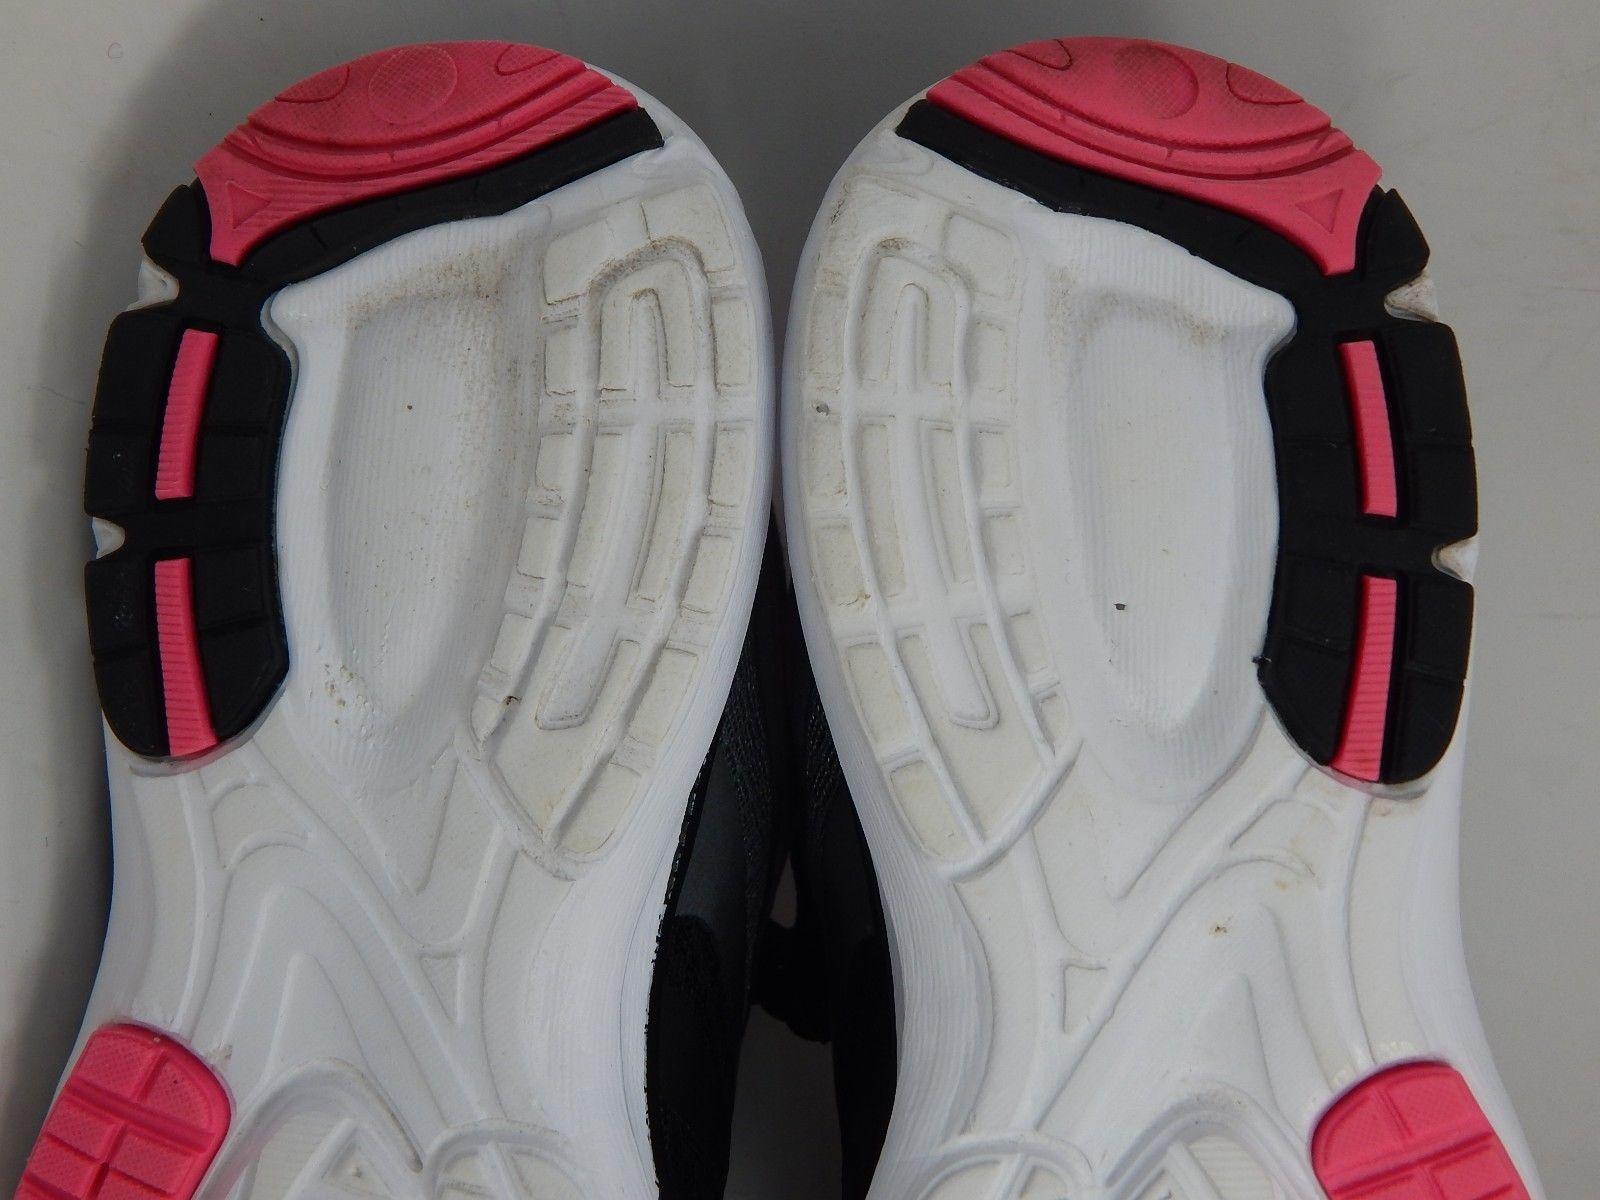 LA Gear Honey Women's Running Shoes Size US 8 M (B) EU 40 Black Gray Pink